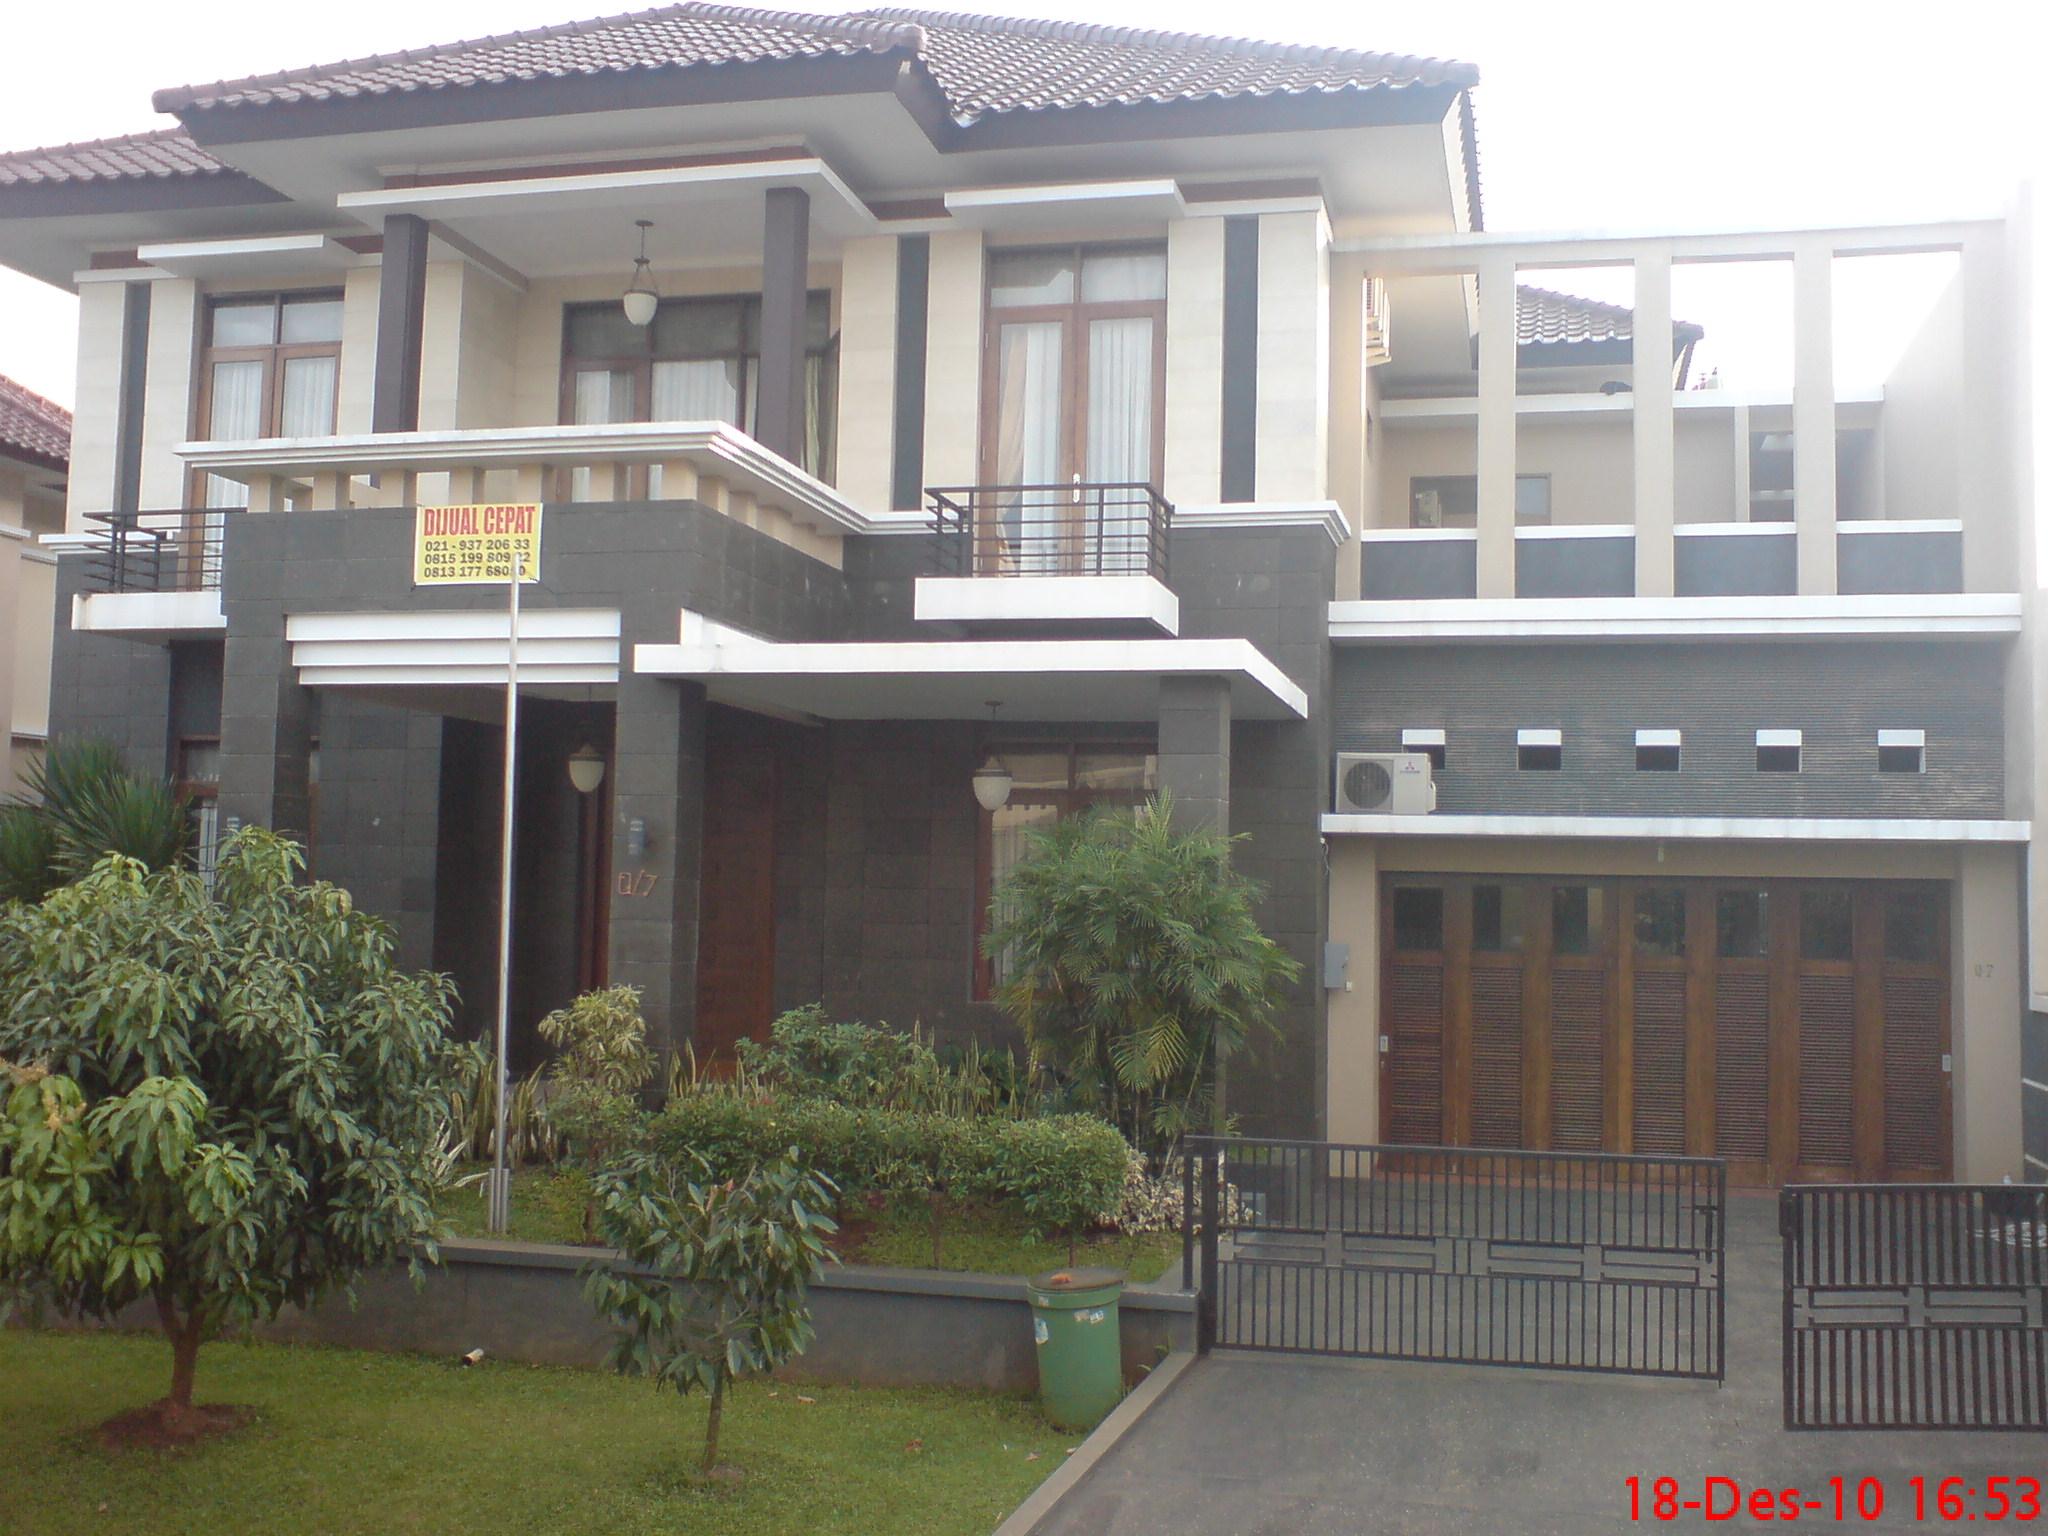 Rumah mewah dijual di Lebak Bulus, Jakarta Selatan